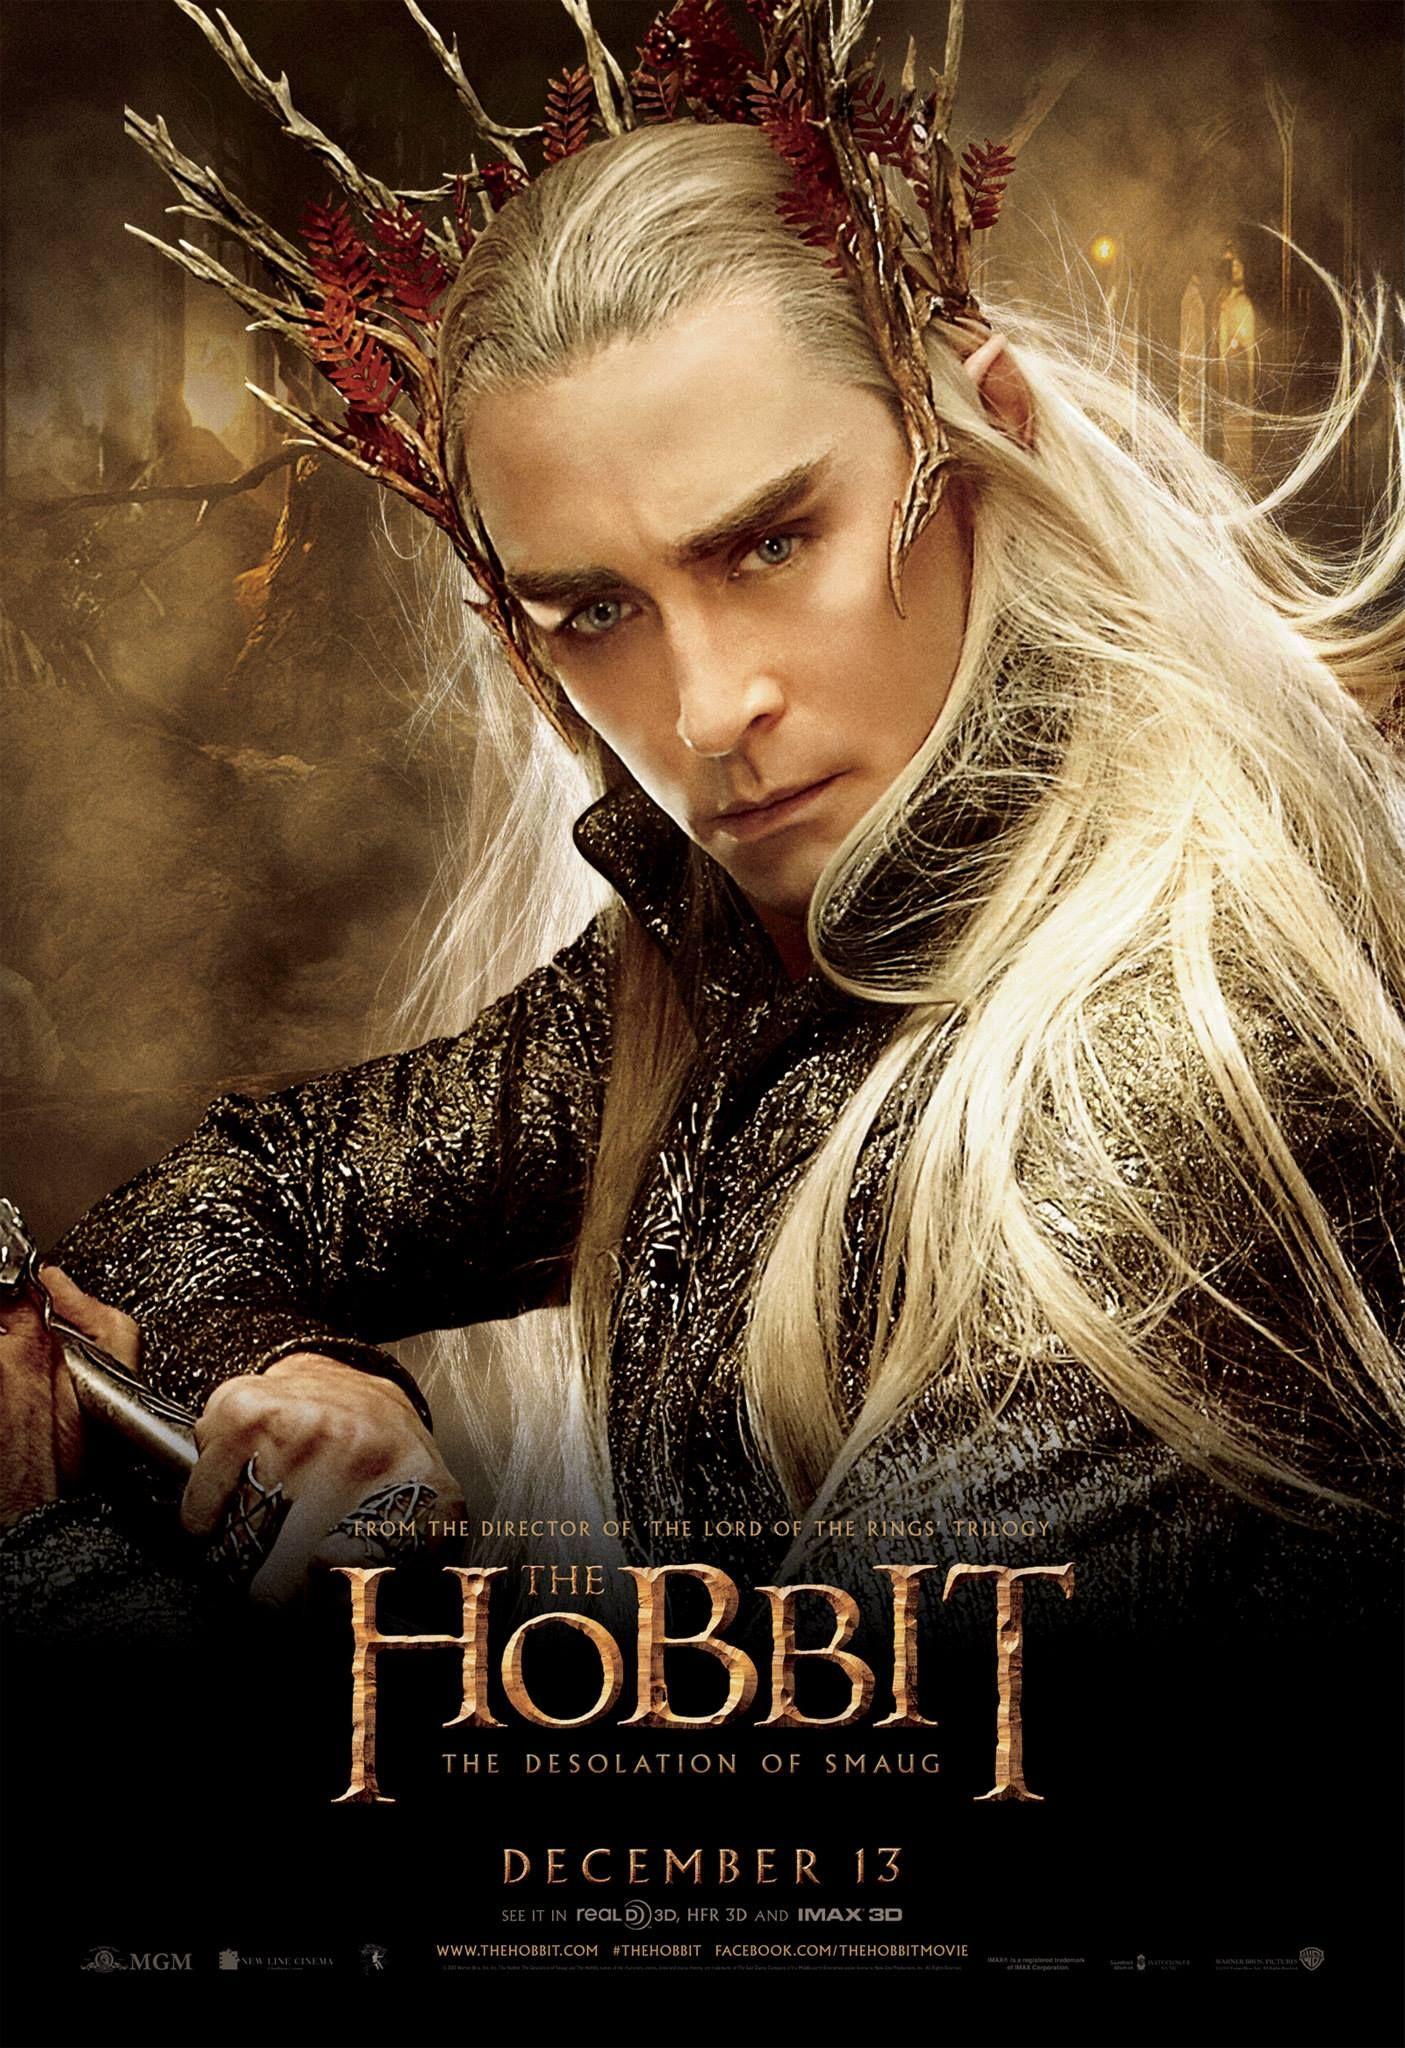 Thranduil Heart Stopper Says Persy Of Http Persephanependrake Com The Hobbit Thranduil Hobbit Desolation Of Smaug Thranduil